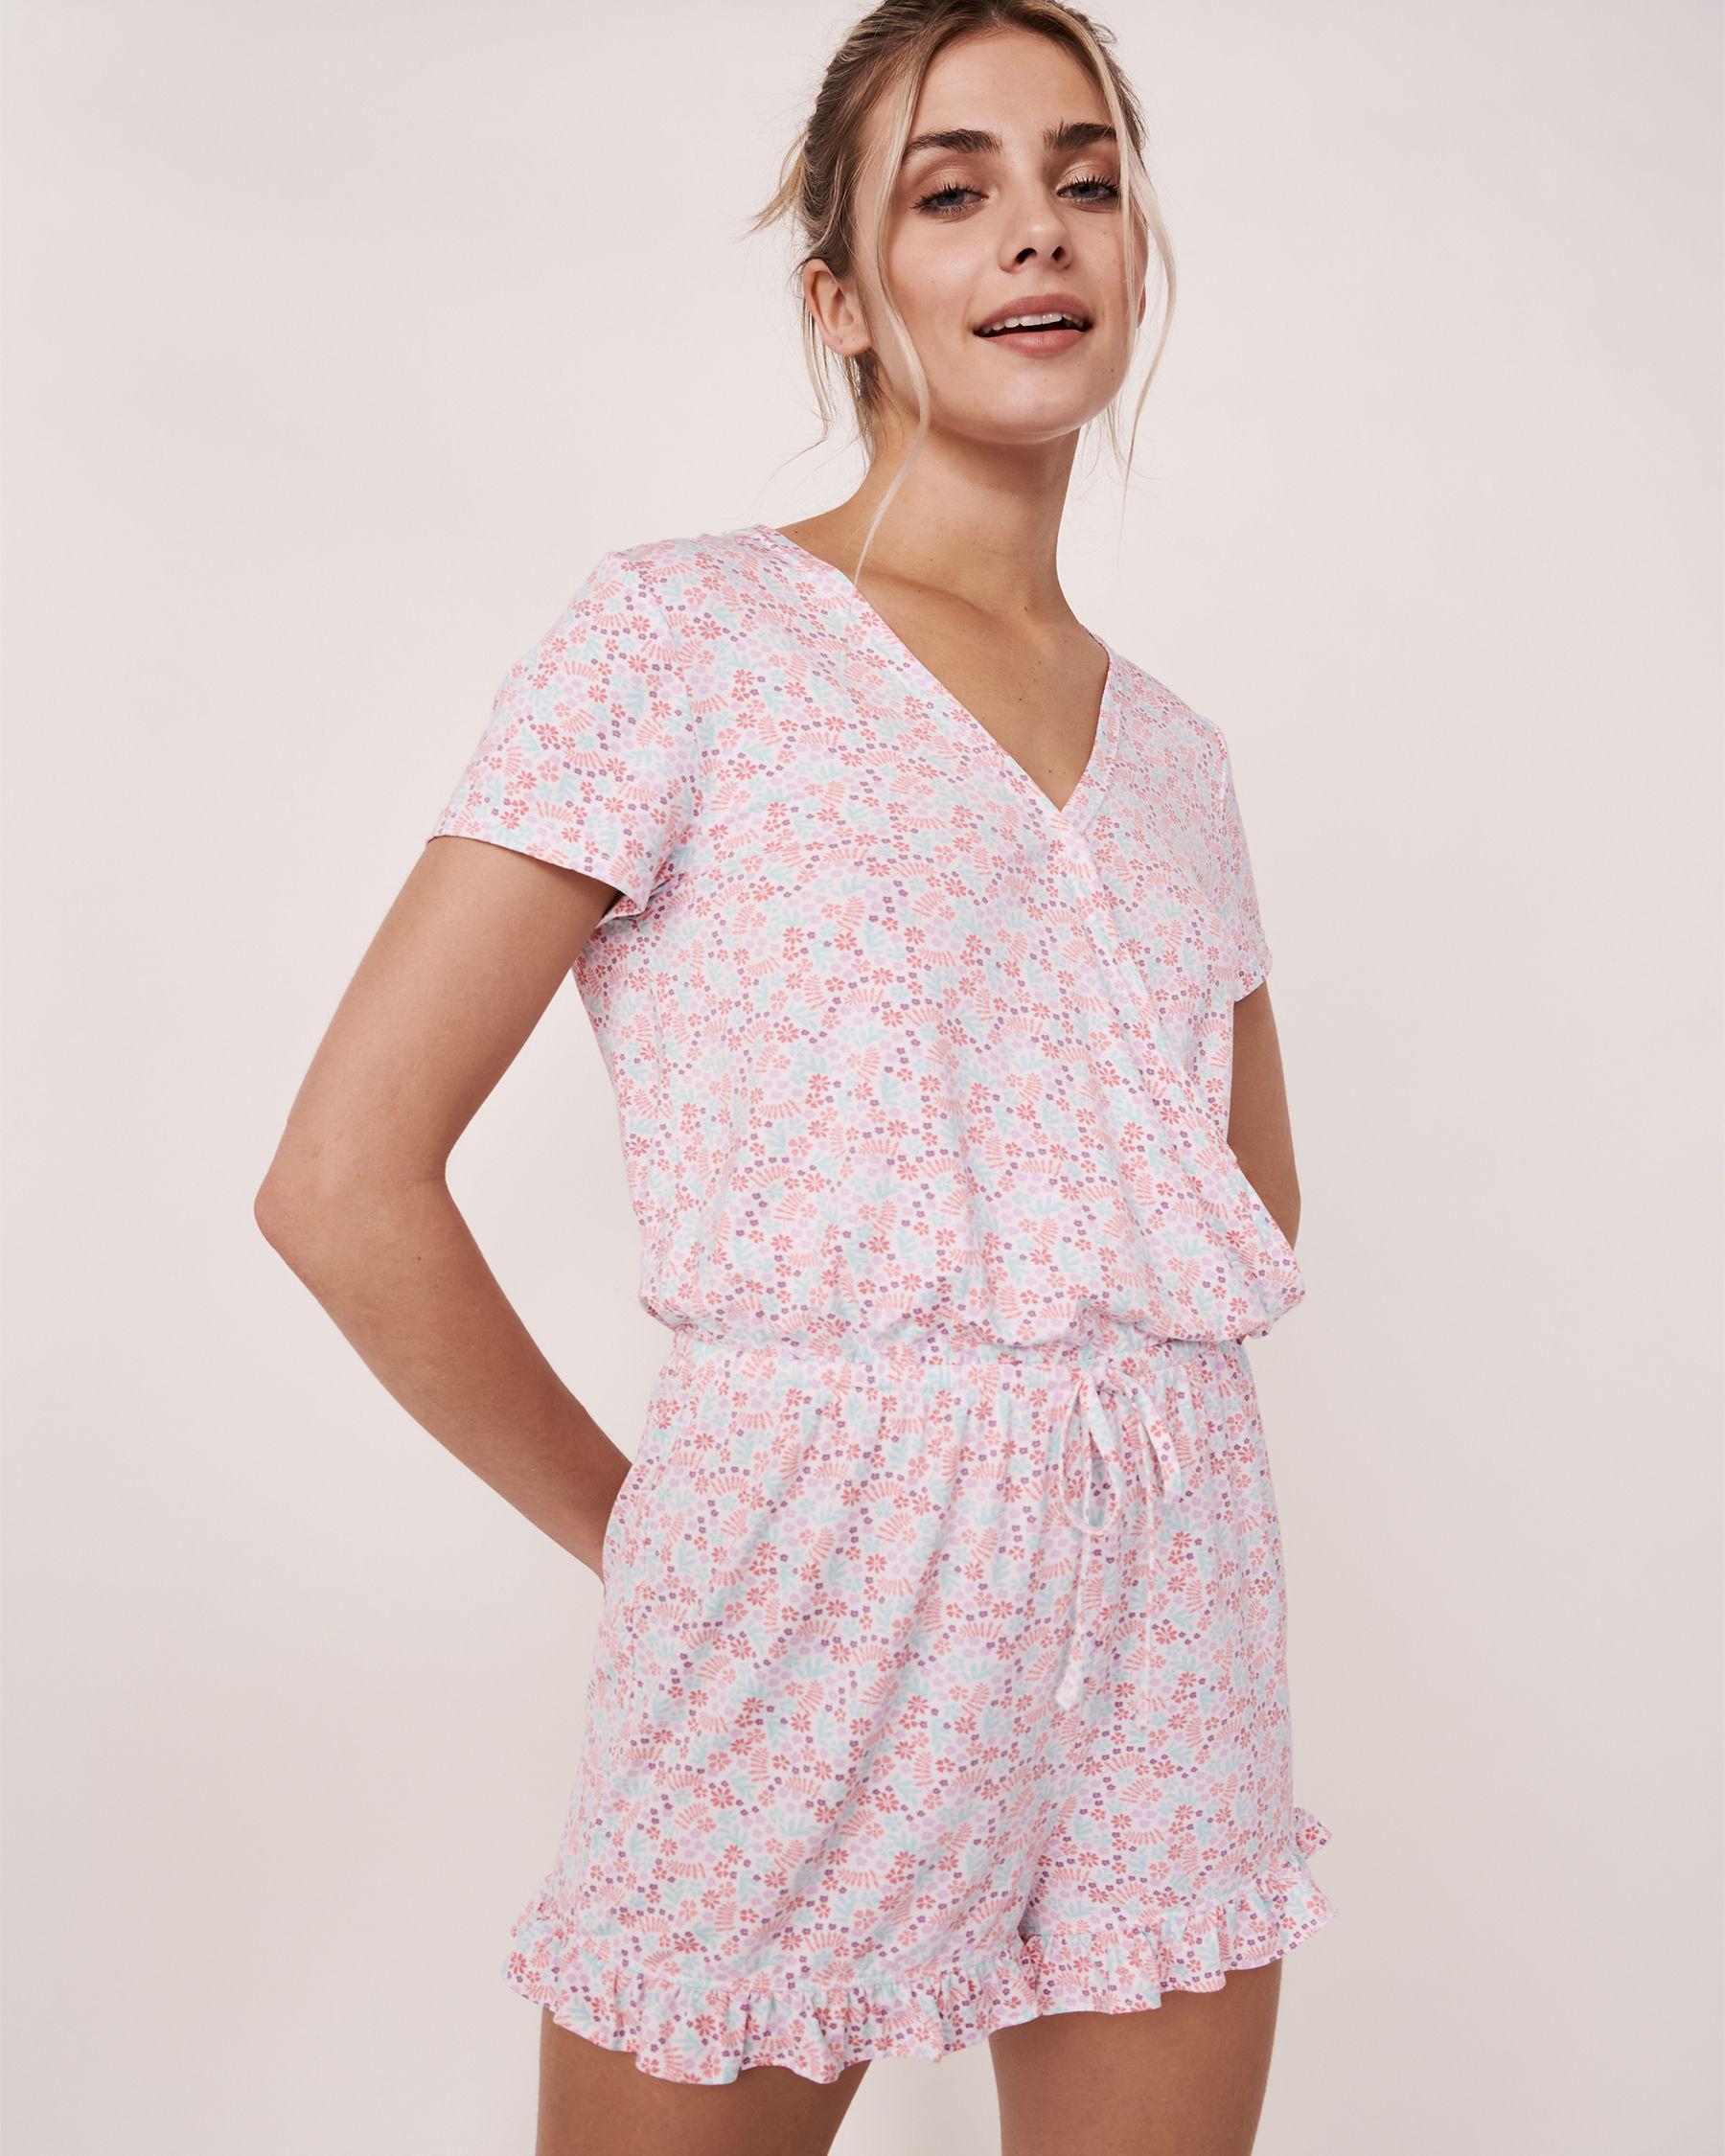 LA VIE EN ROSE Ruffle Details Short Sleeve Romper Ditsy floral 40300012 - View1